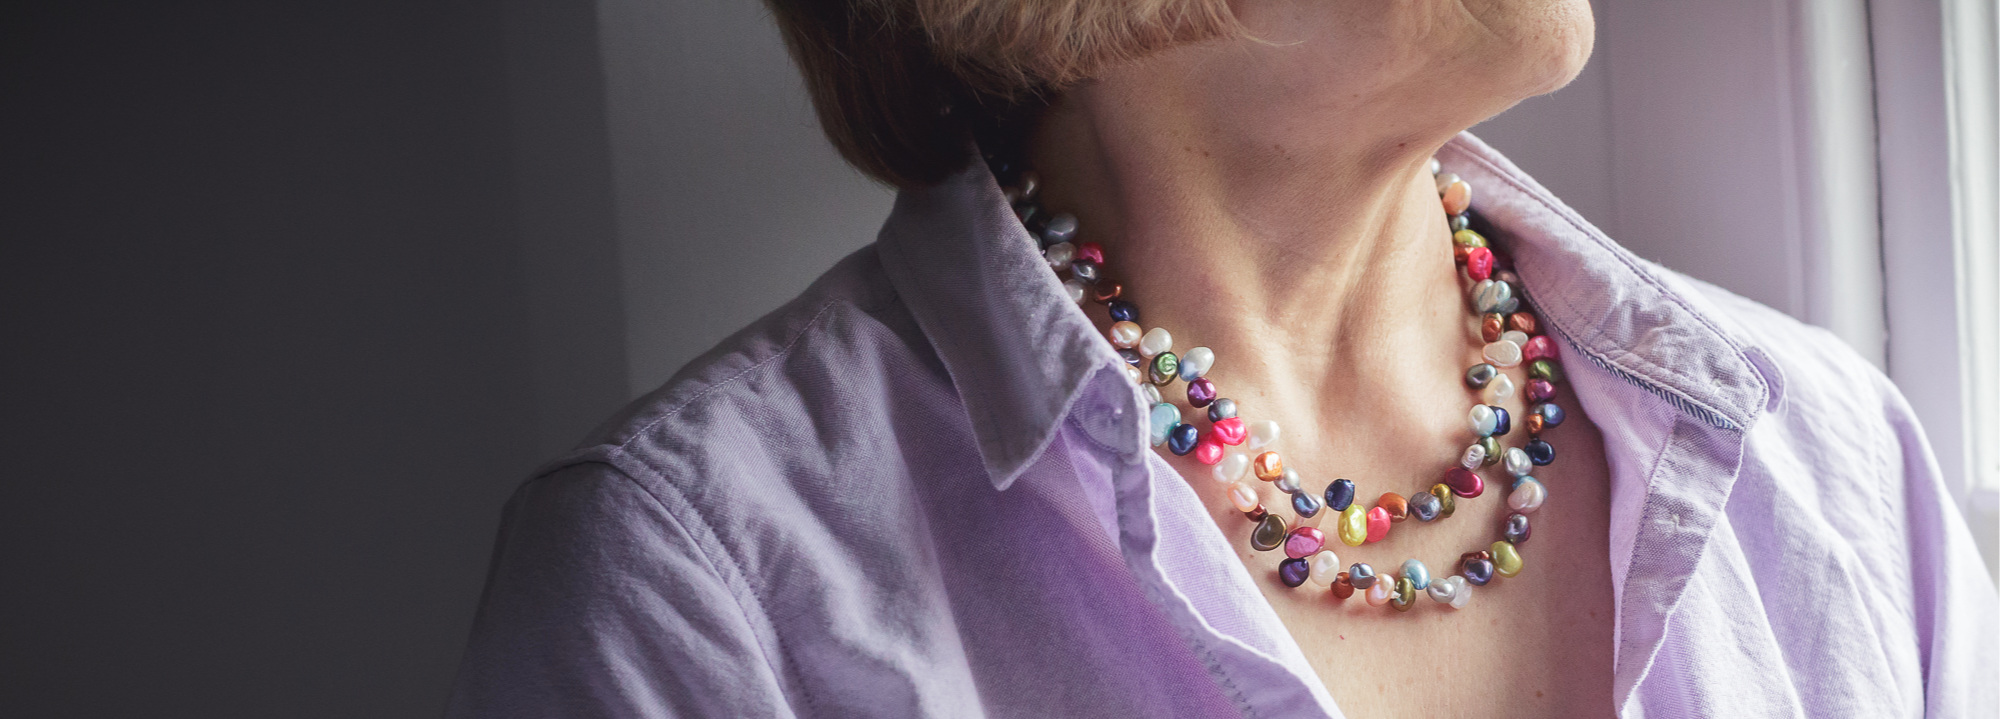 Irene - Pearls coloured 001.jpg